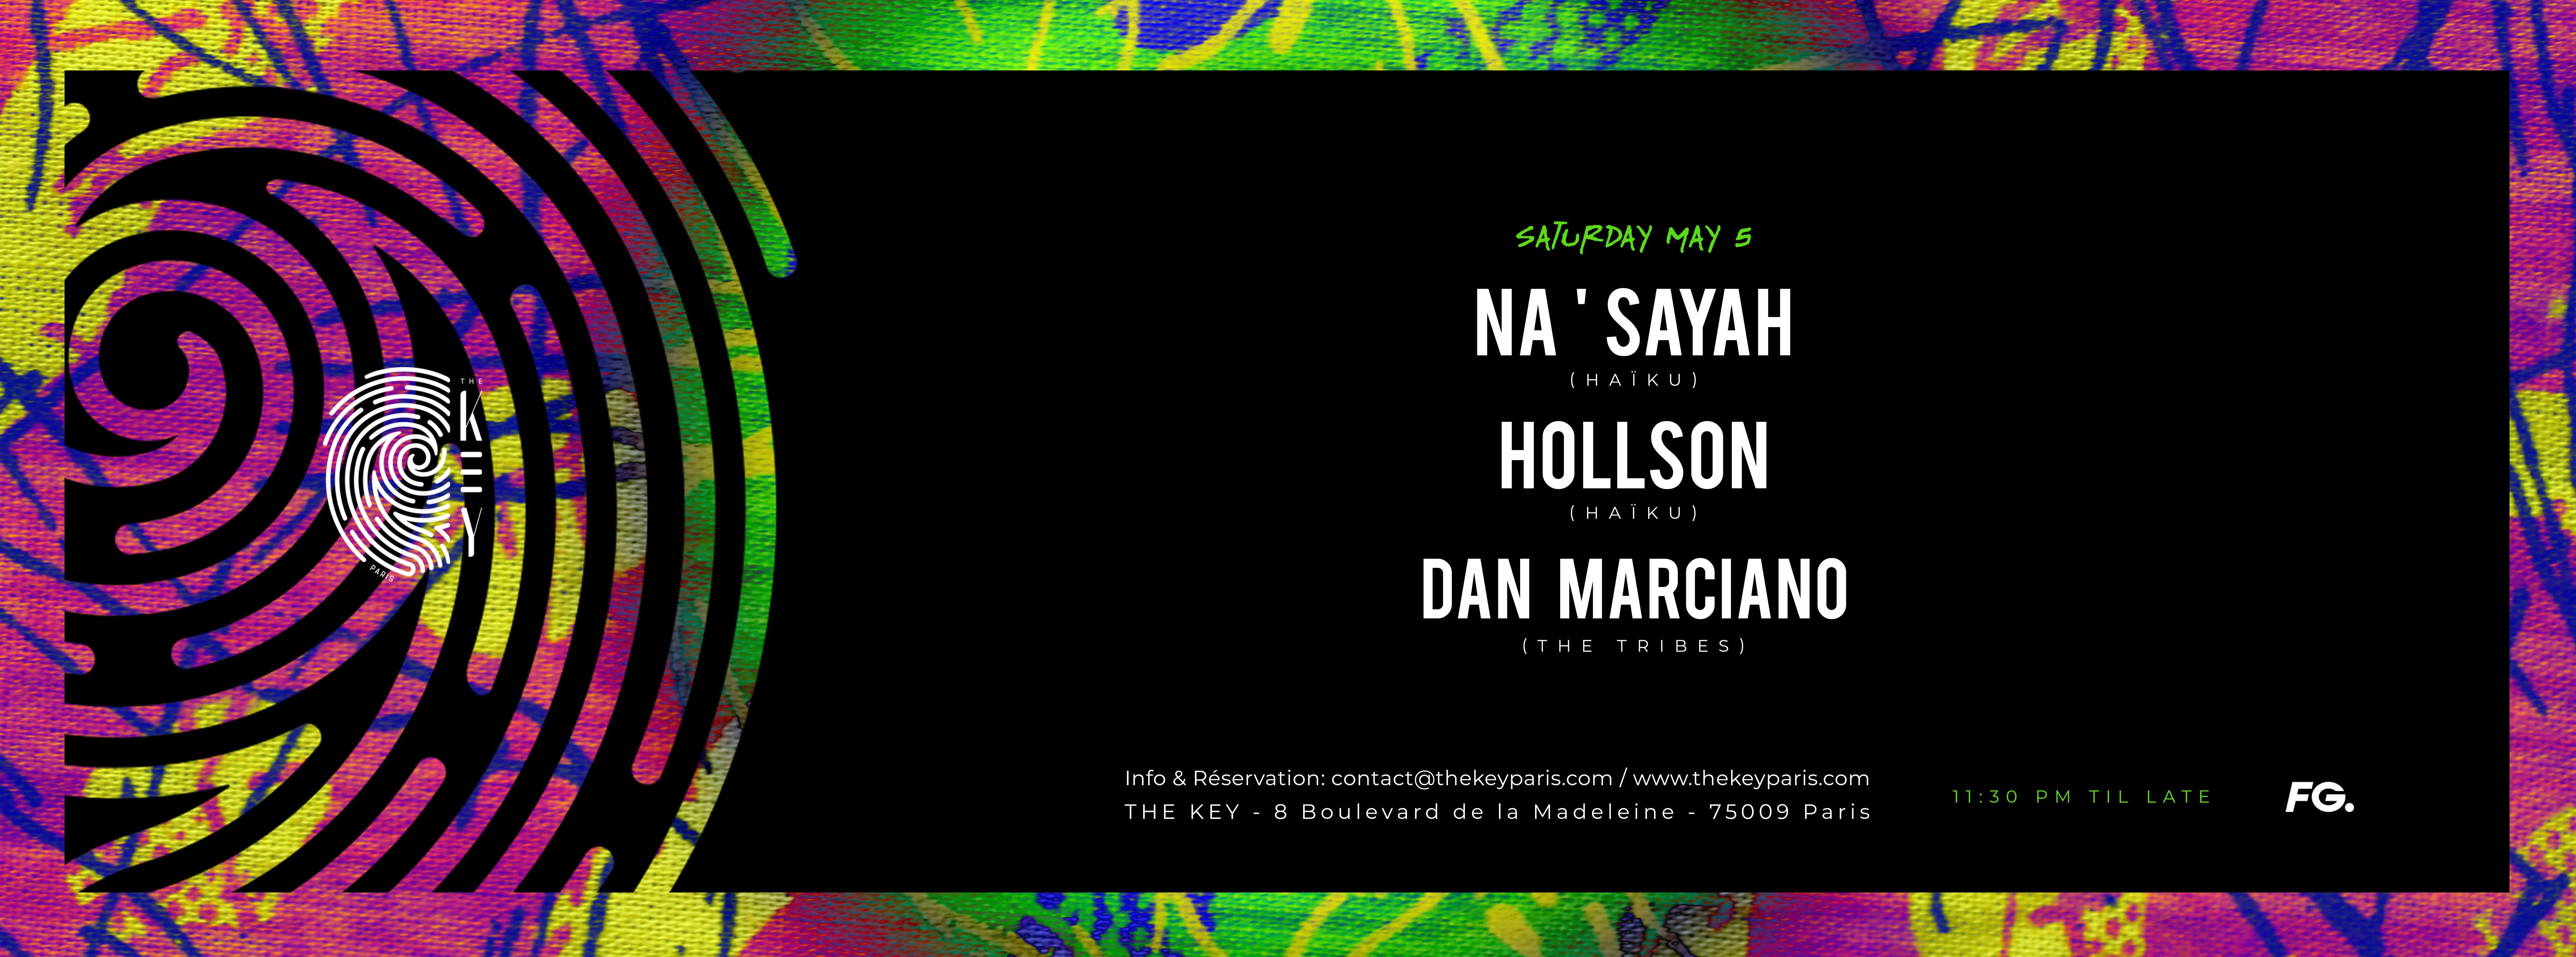 The Key Presents: Na'Sayah, Hollson, Dan Marciano